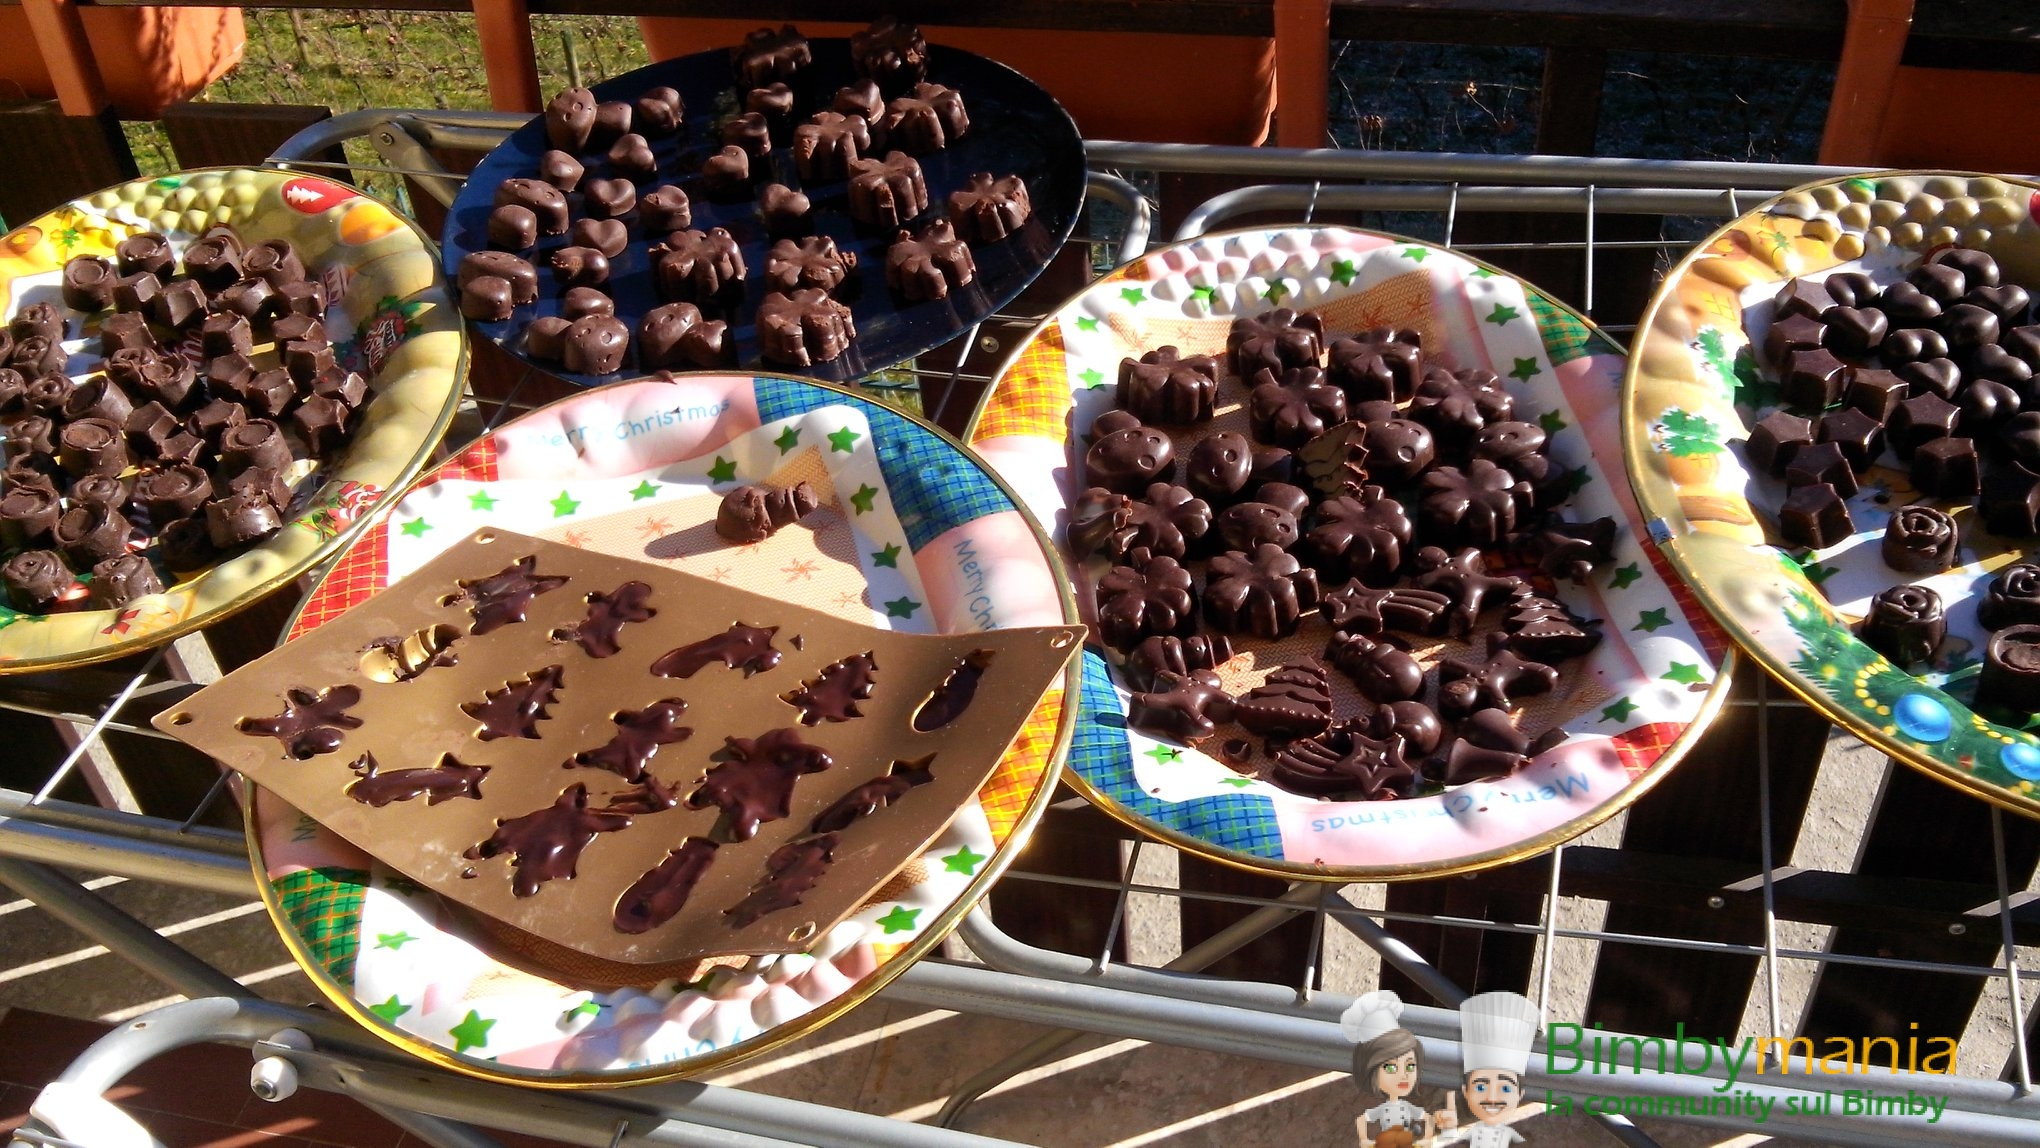 cioccolatini al peperoncino e pepe rosa Bimby